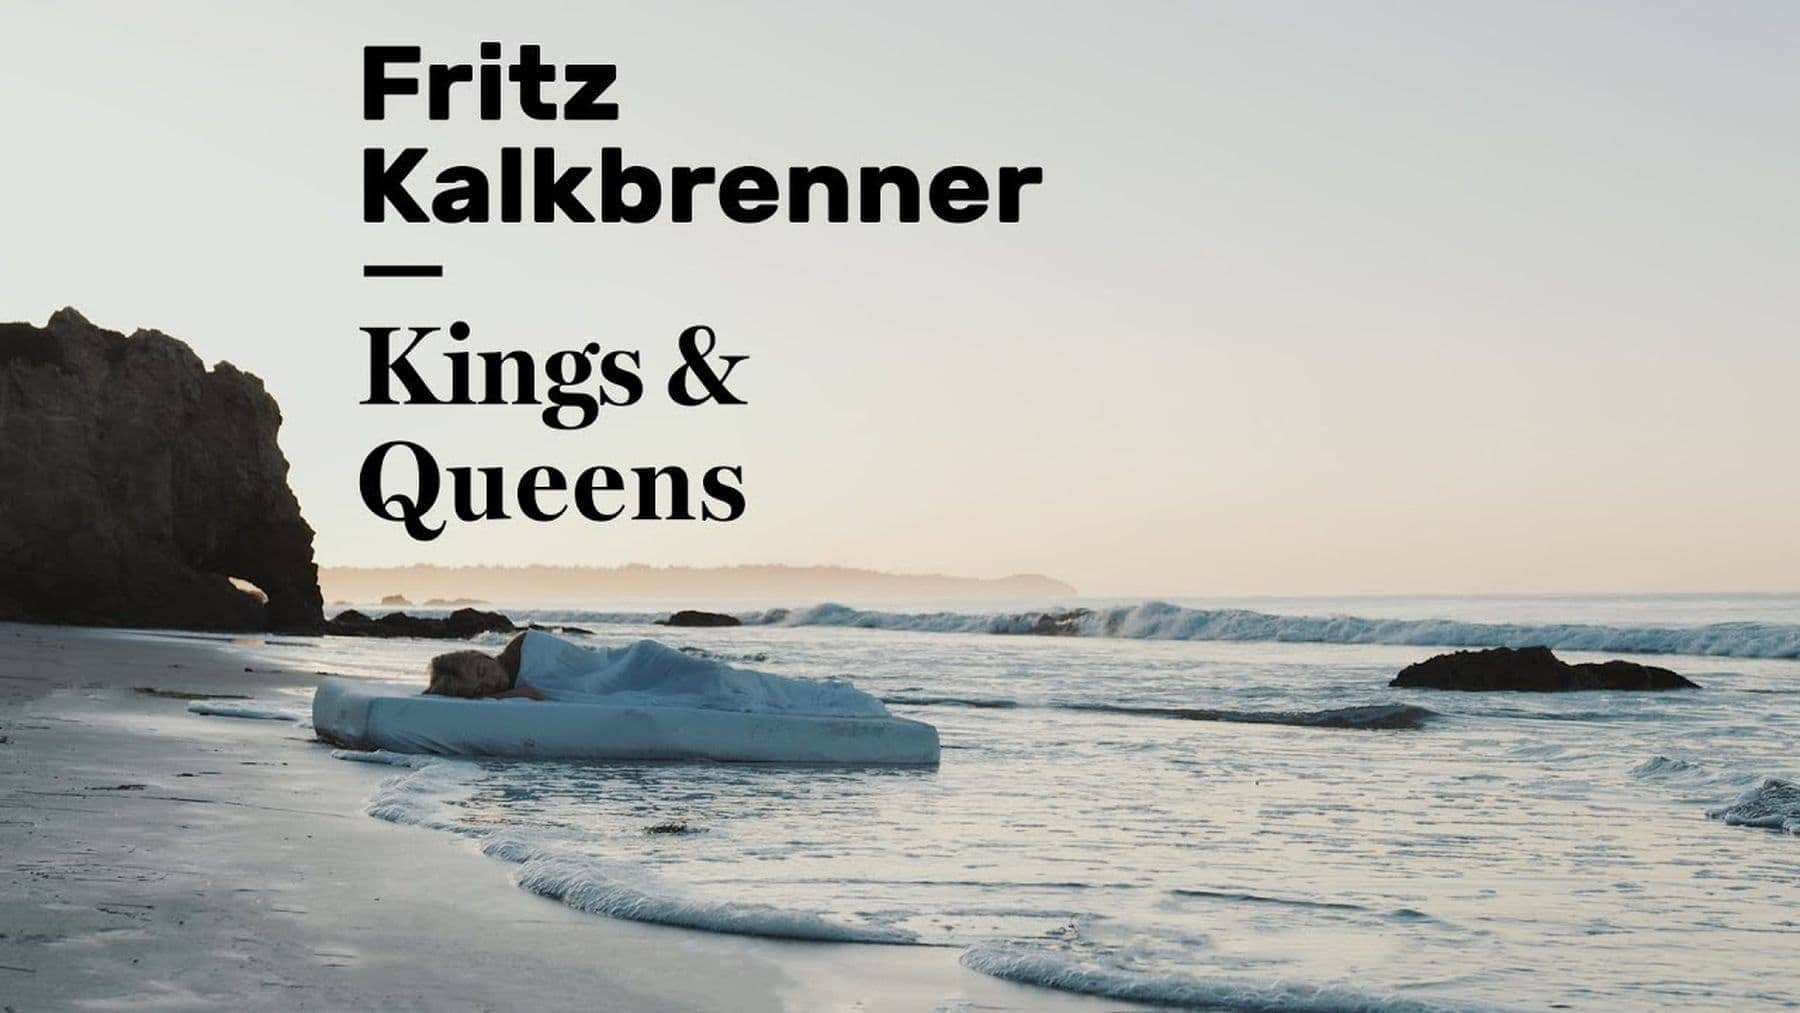 Fritz Kalkbrenner - Kings & Queens   Musik   Was is hier eigentlich los?